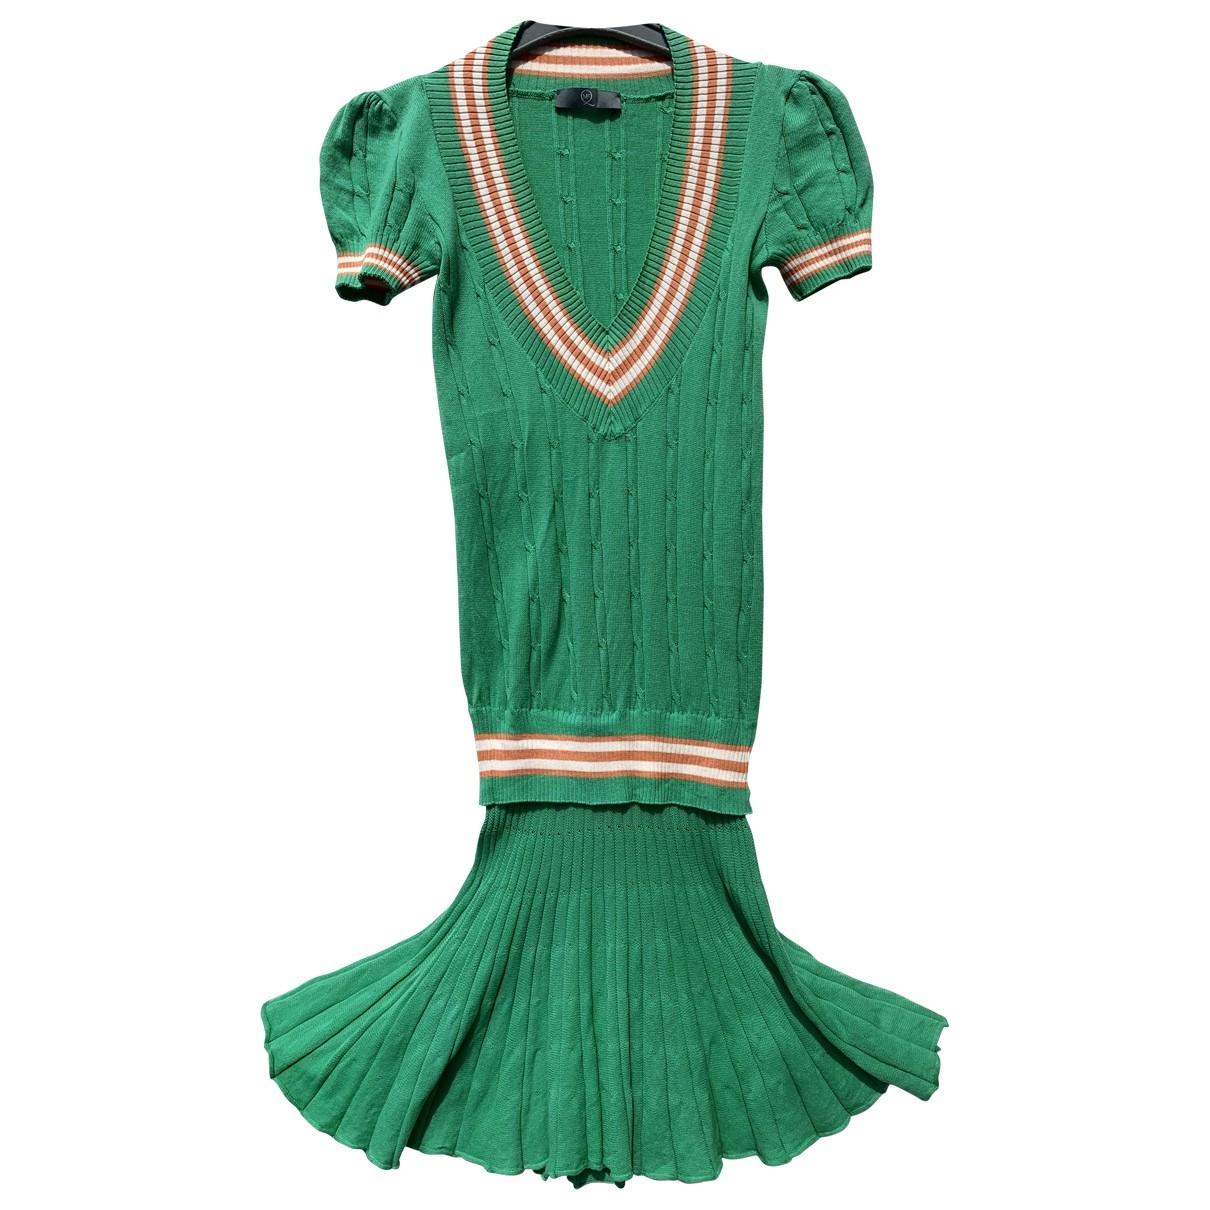 Mcq - Robe   pour femme en coton - elasthane - vert